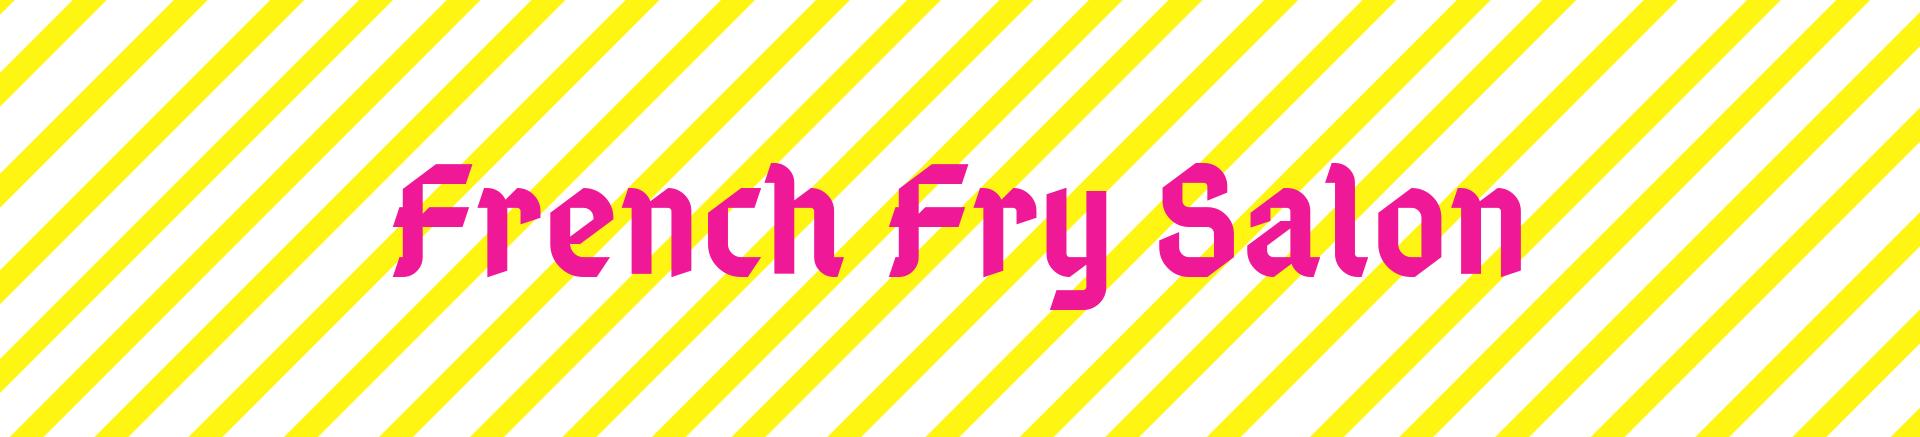 French Fry Salon